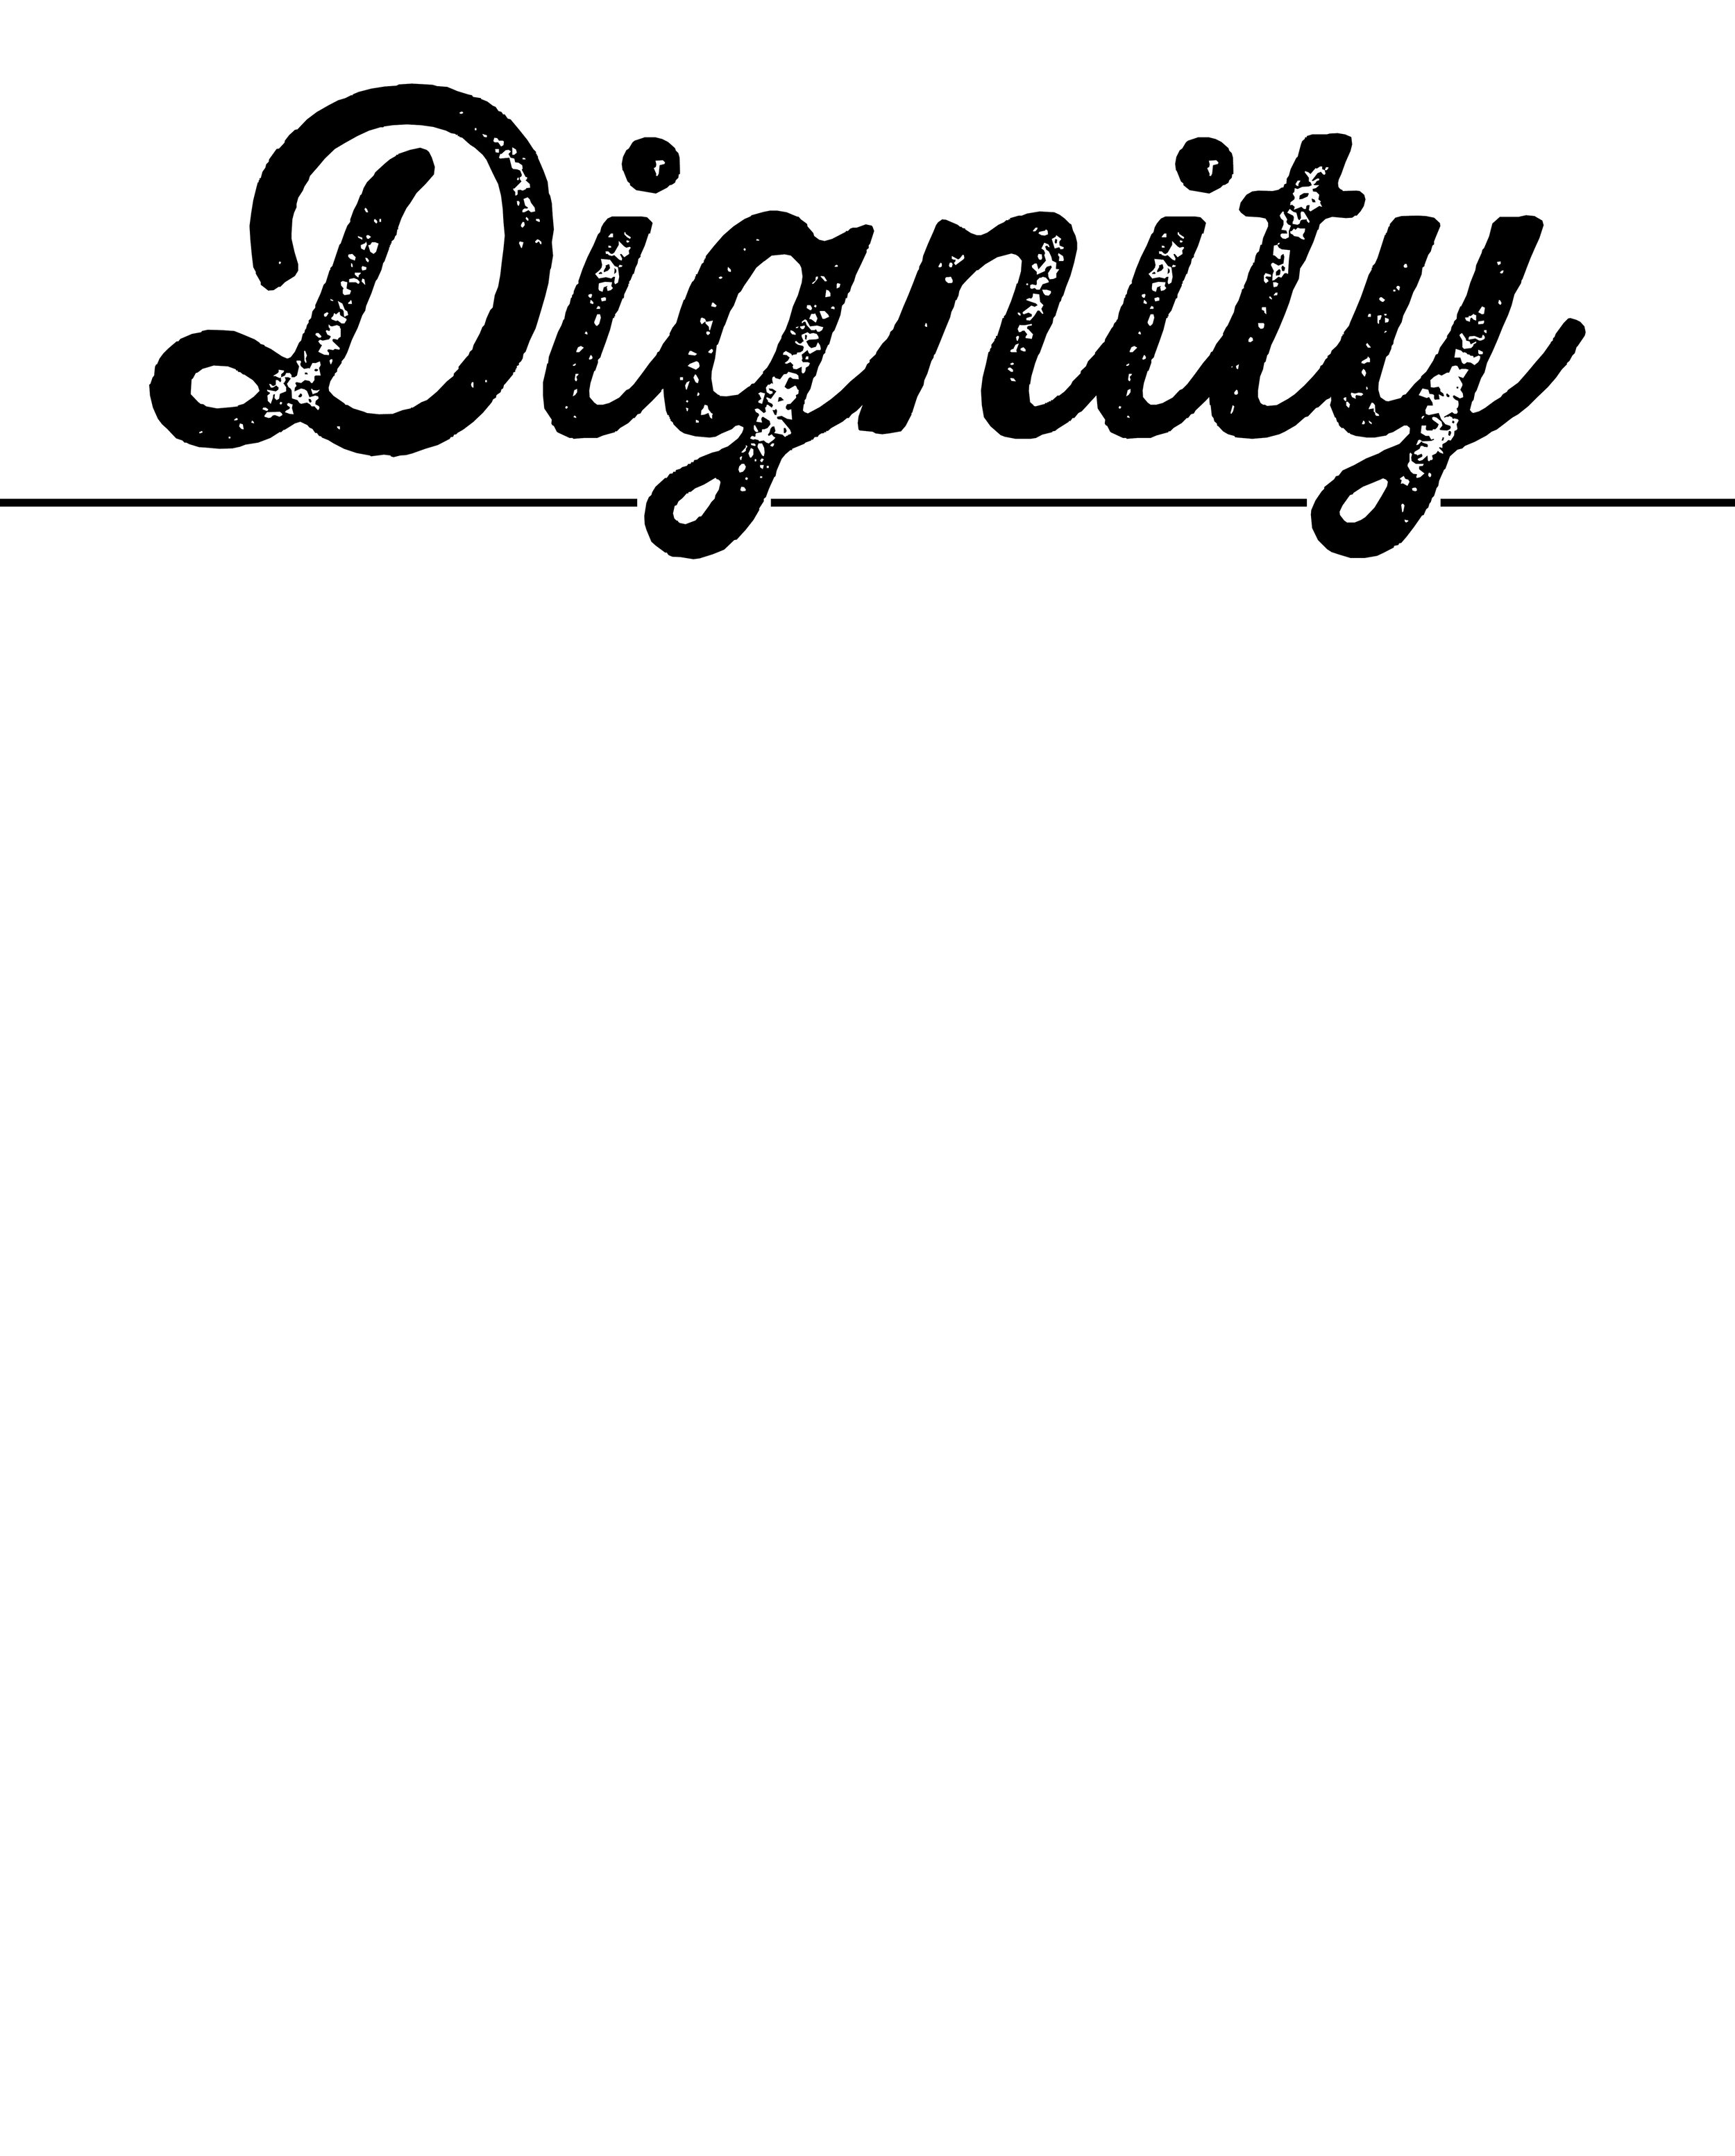 98. DIGNITY BlankPoster.jpg